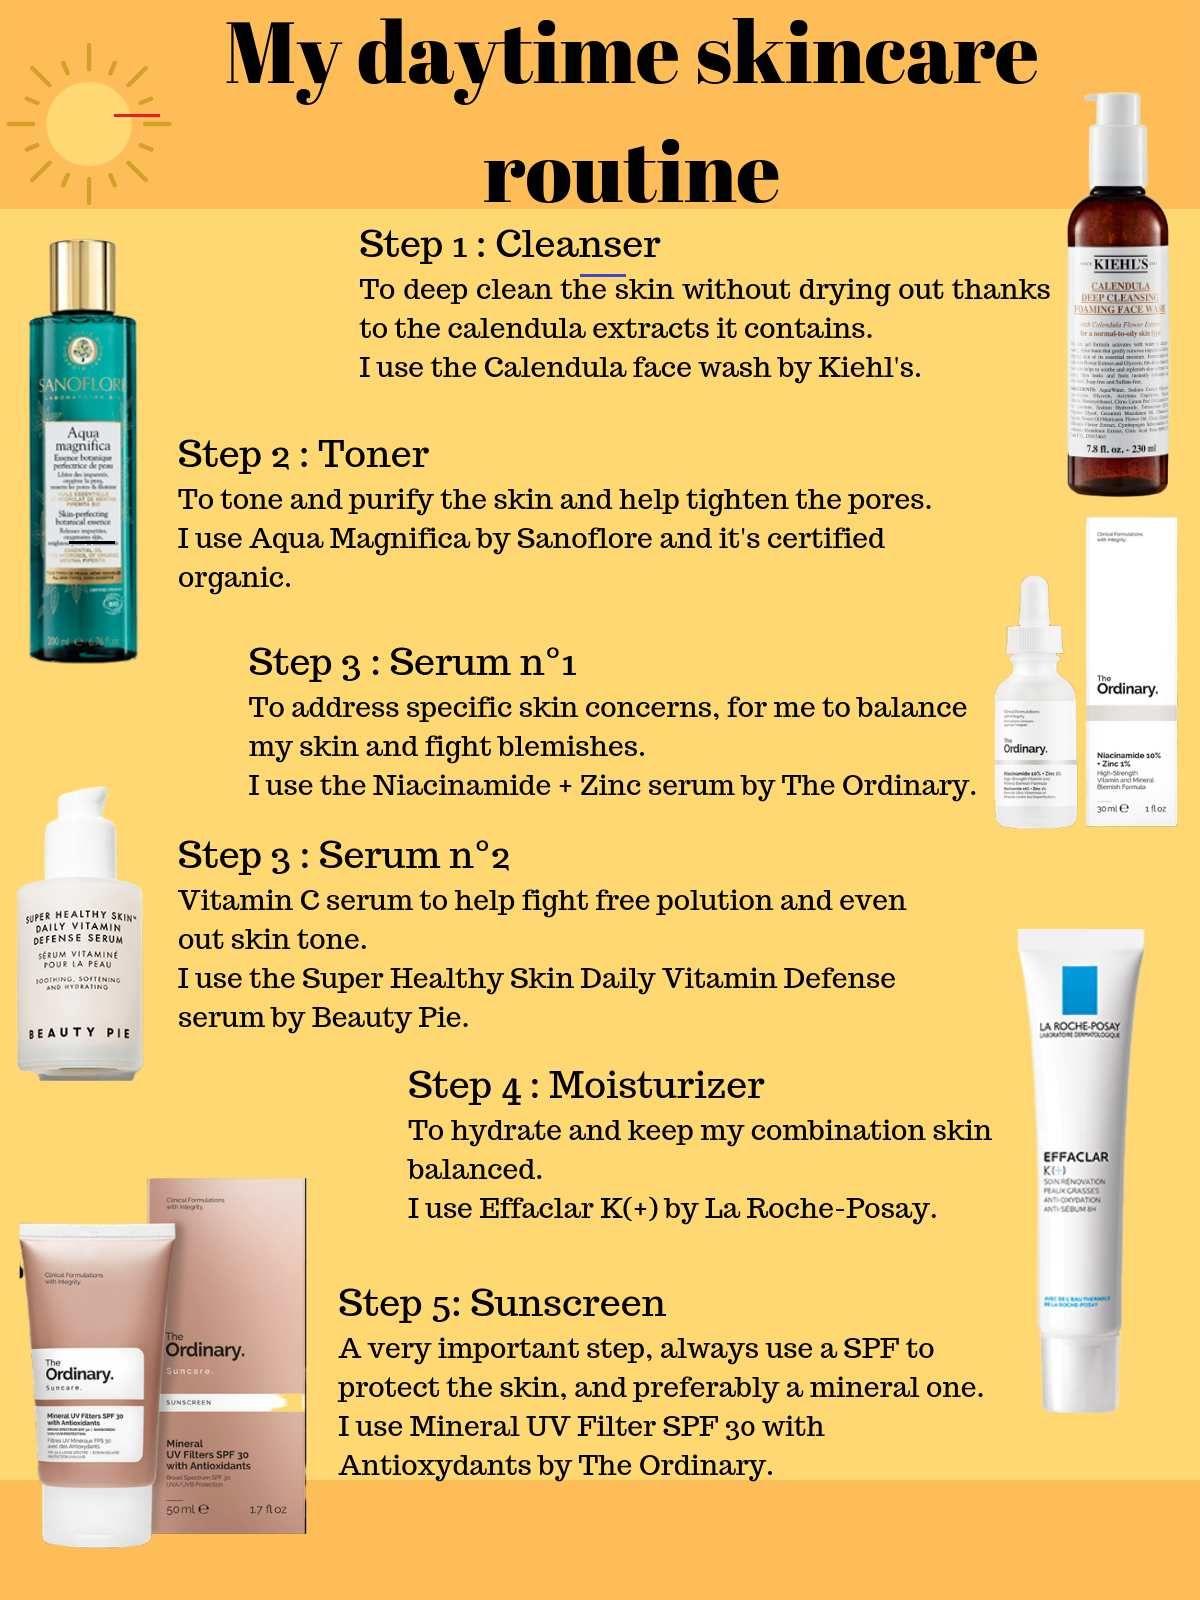 Skincare Tips My Morning Skincare Routine For Combination Skin Skincareroutine In 2020 Schoonheidstips Huidverzorgingsproducten Schoonheid Routines